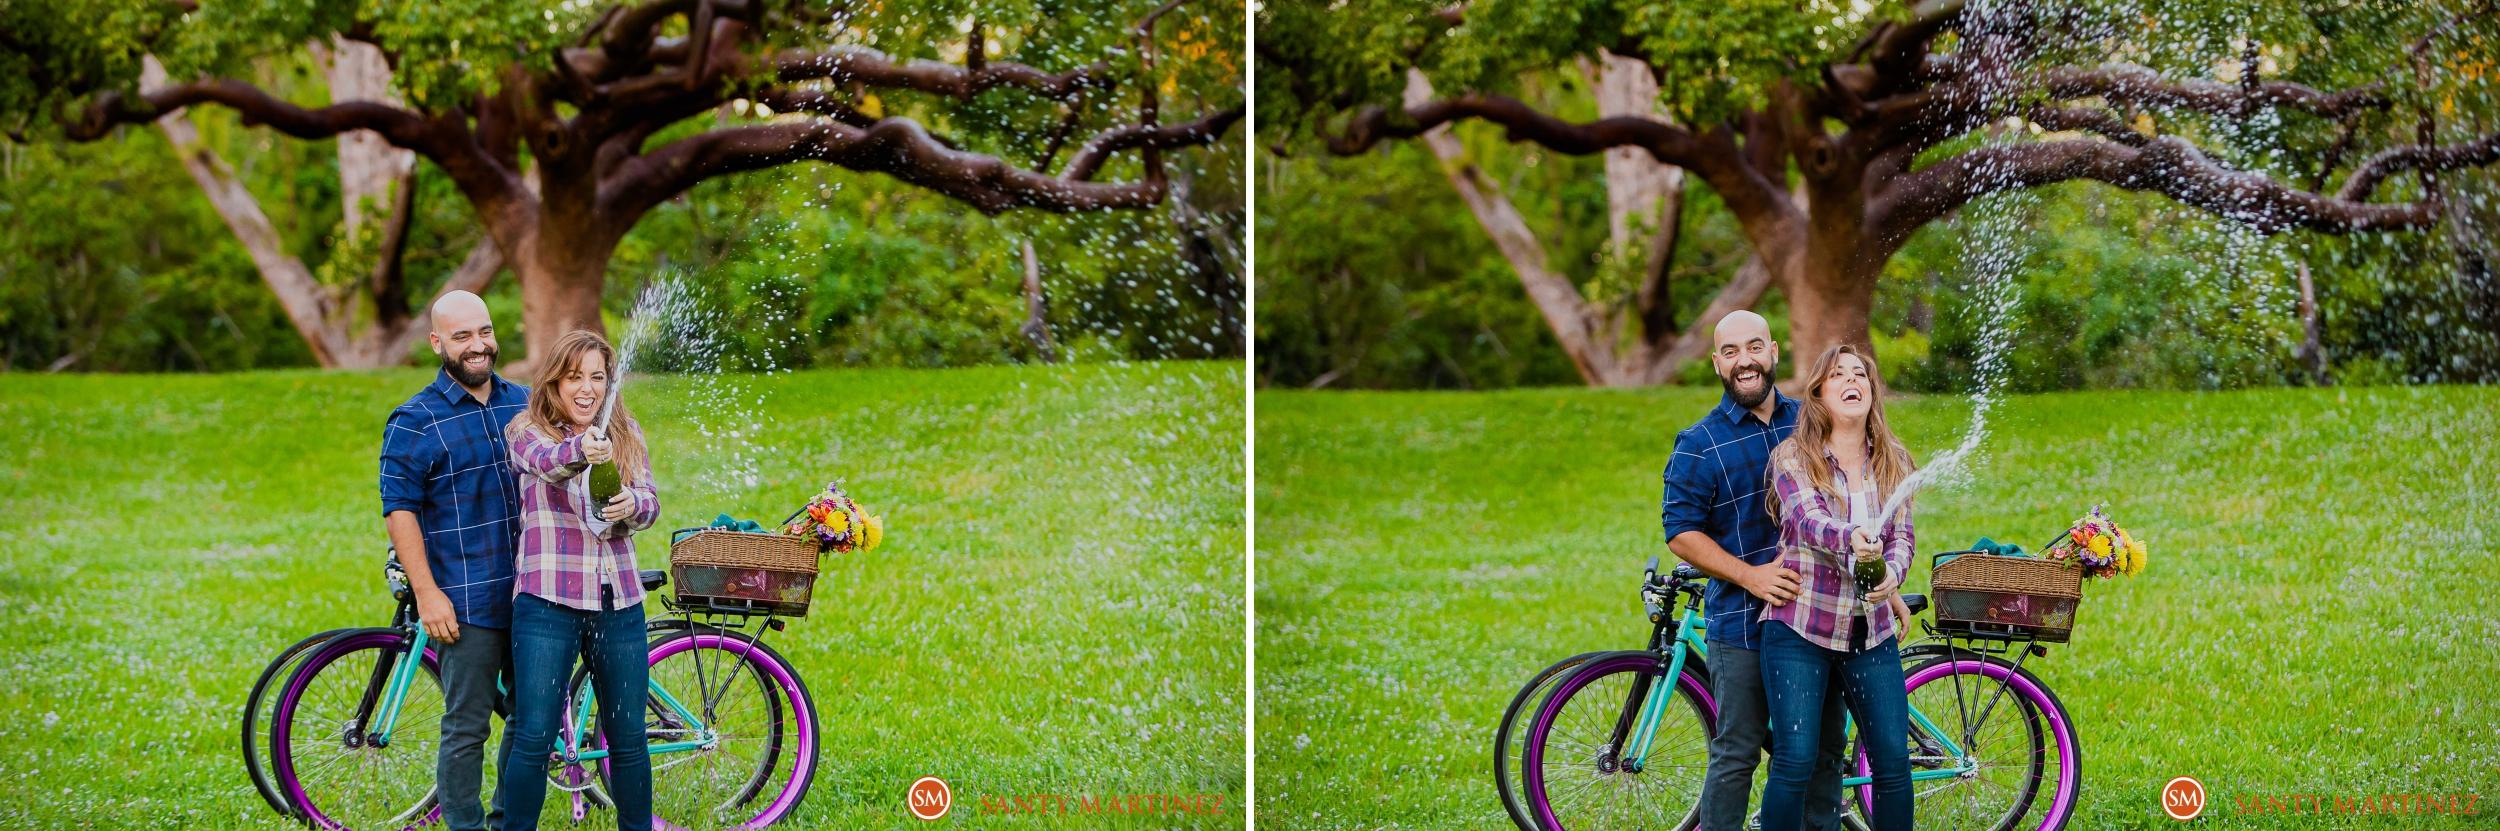 Engagement Session - Greynolds Park - Santy Martinez Photography 7.jpg